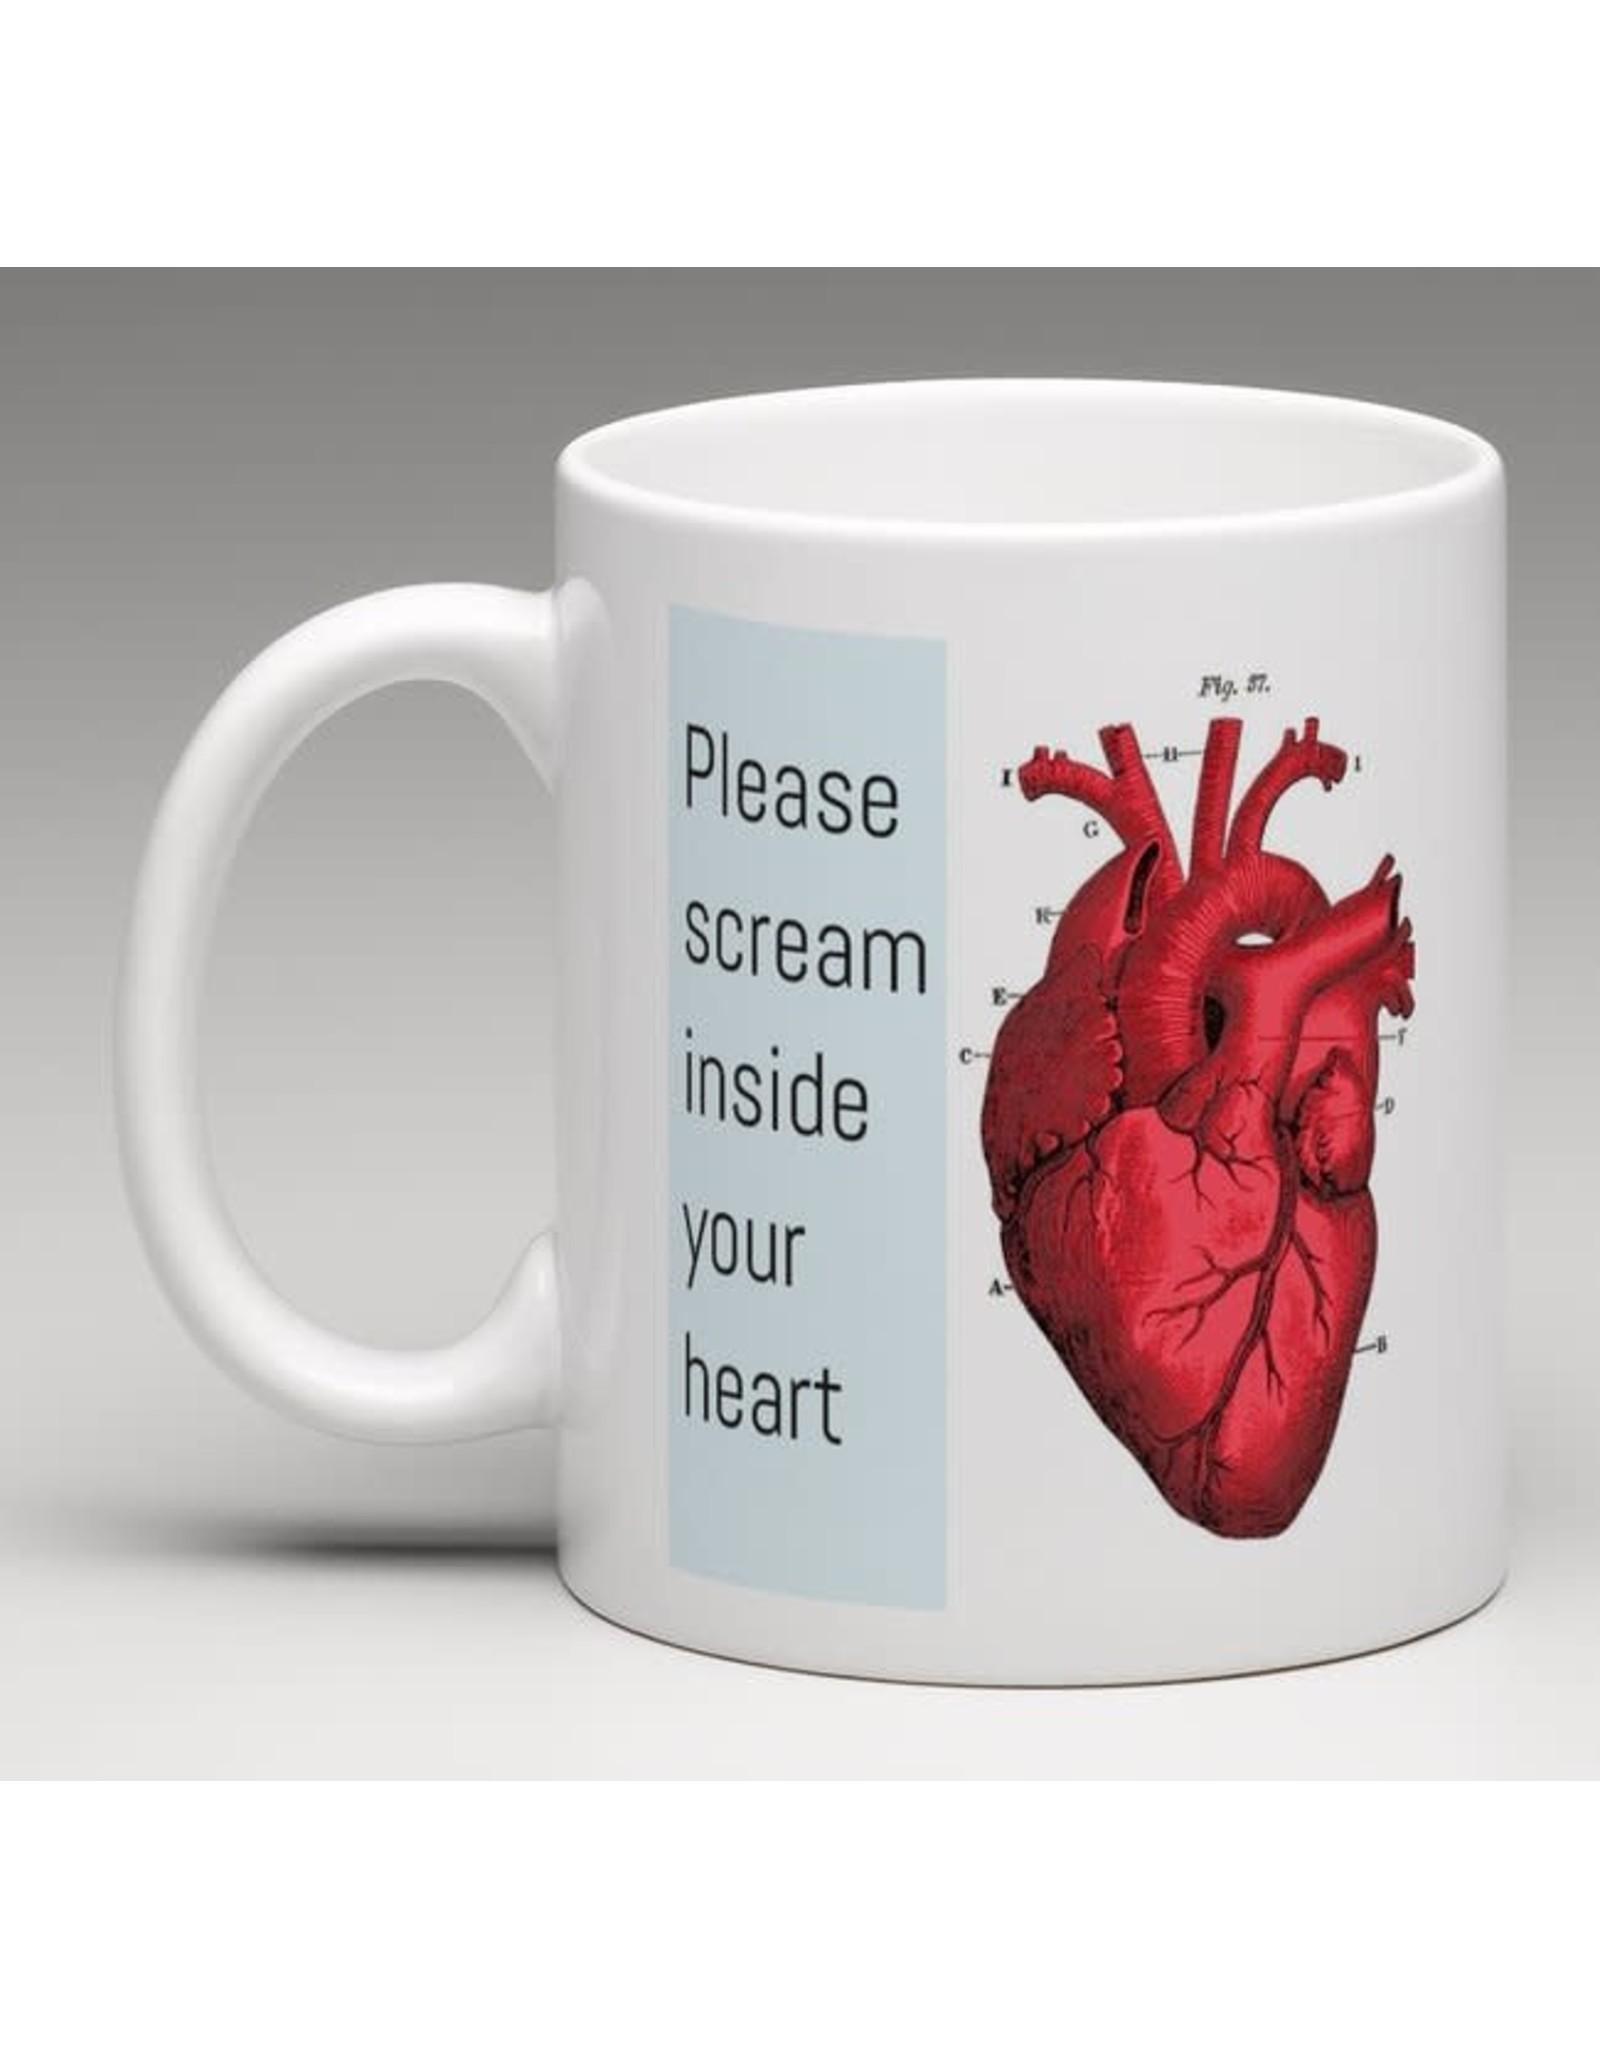 Mug - Scream inside your heart - This Is Fine